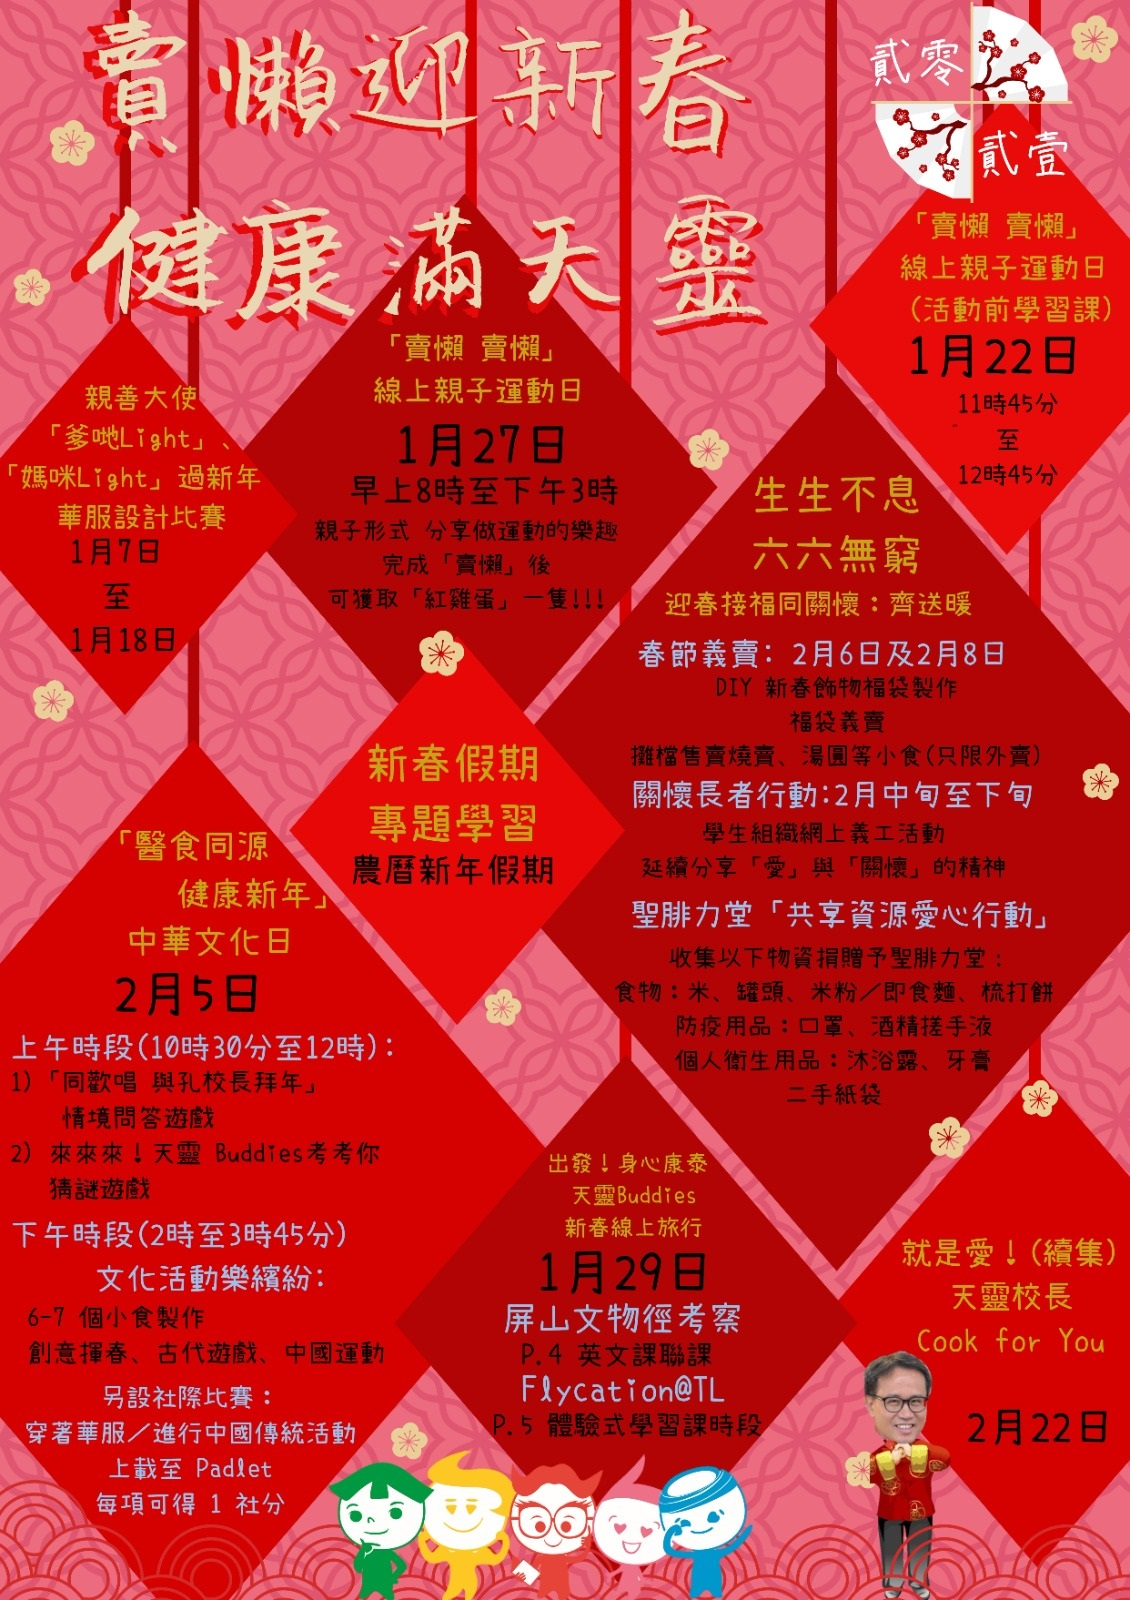 https://www.skhtswlo.edu.hk/sites/default/files/20210129_new_year_event_poster.jpg